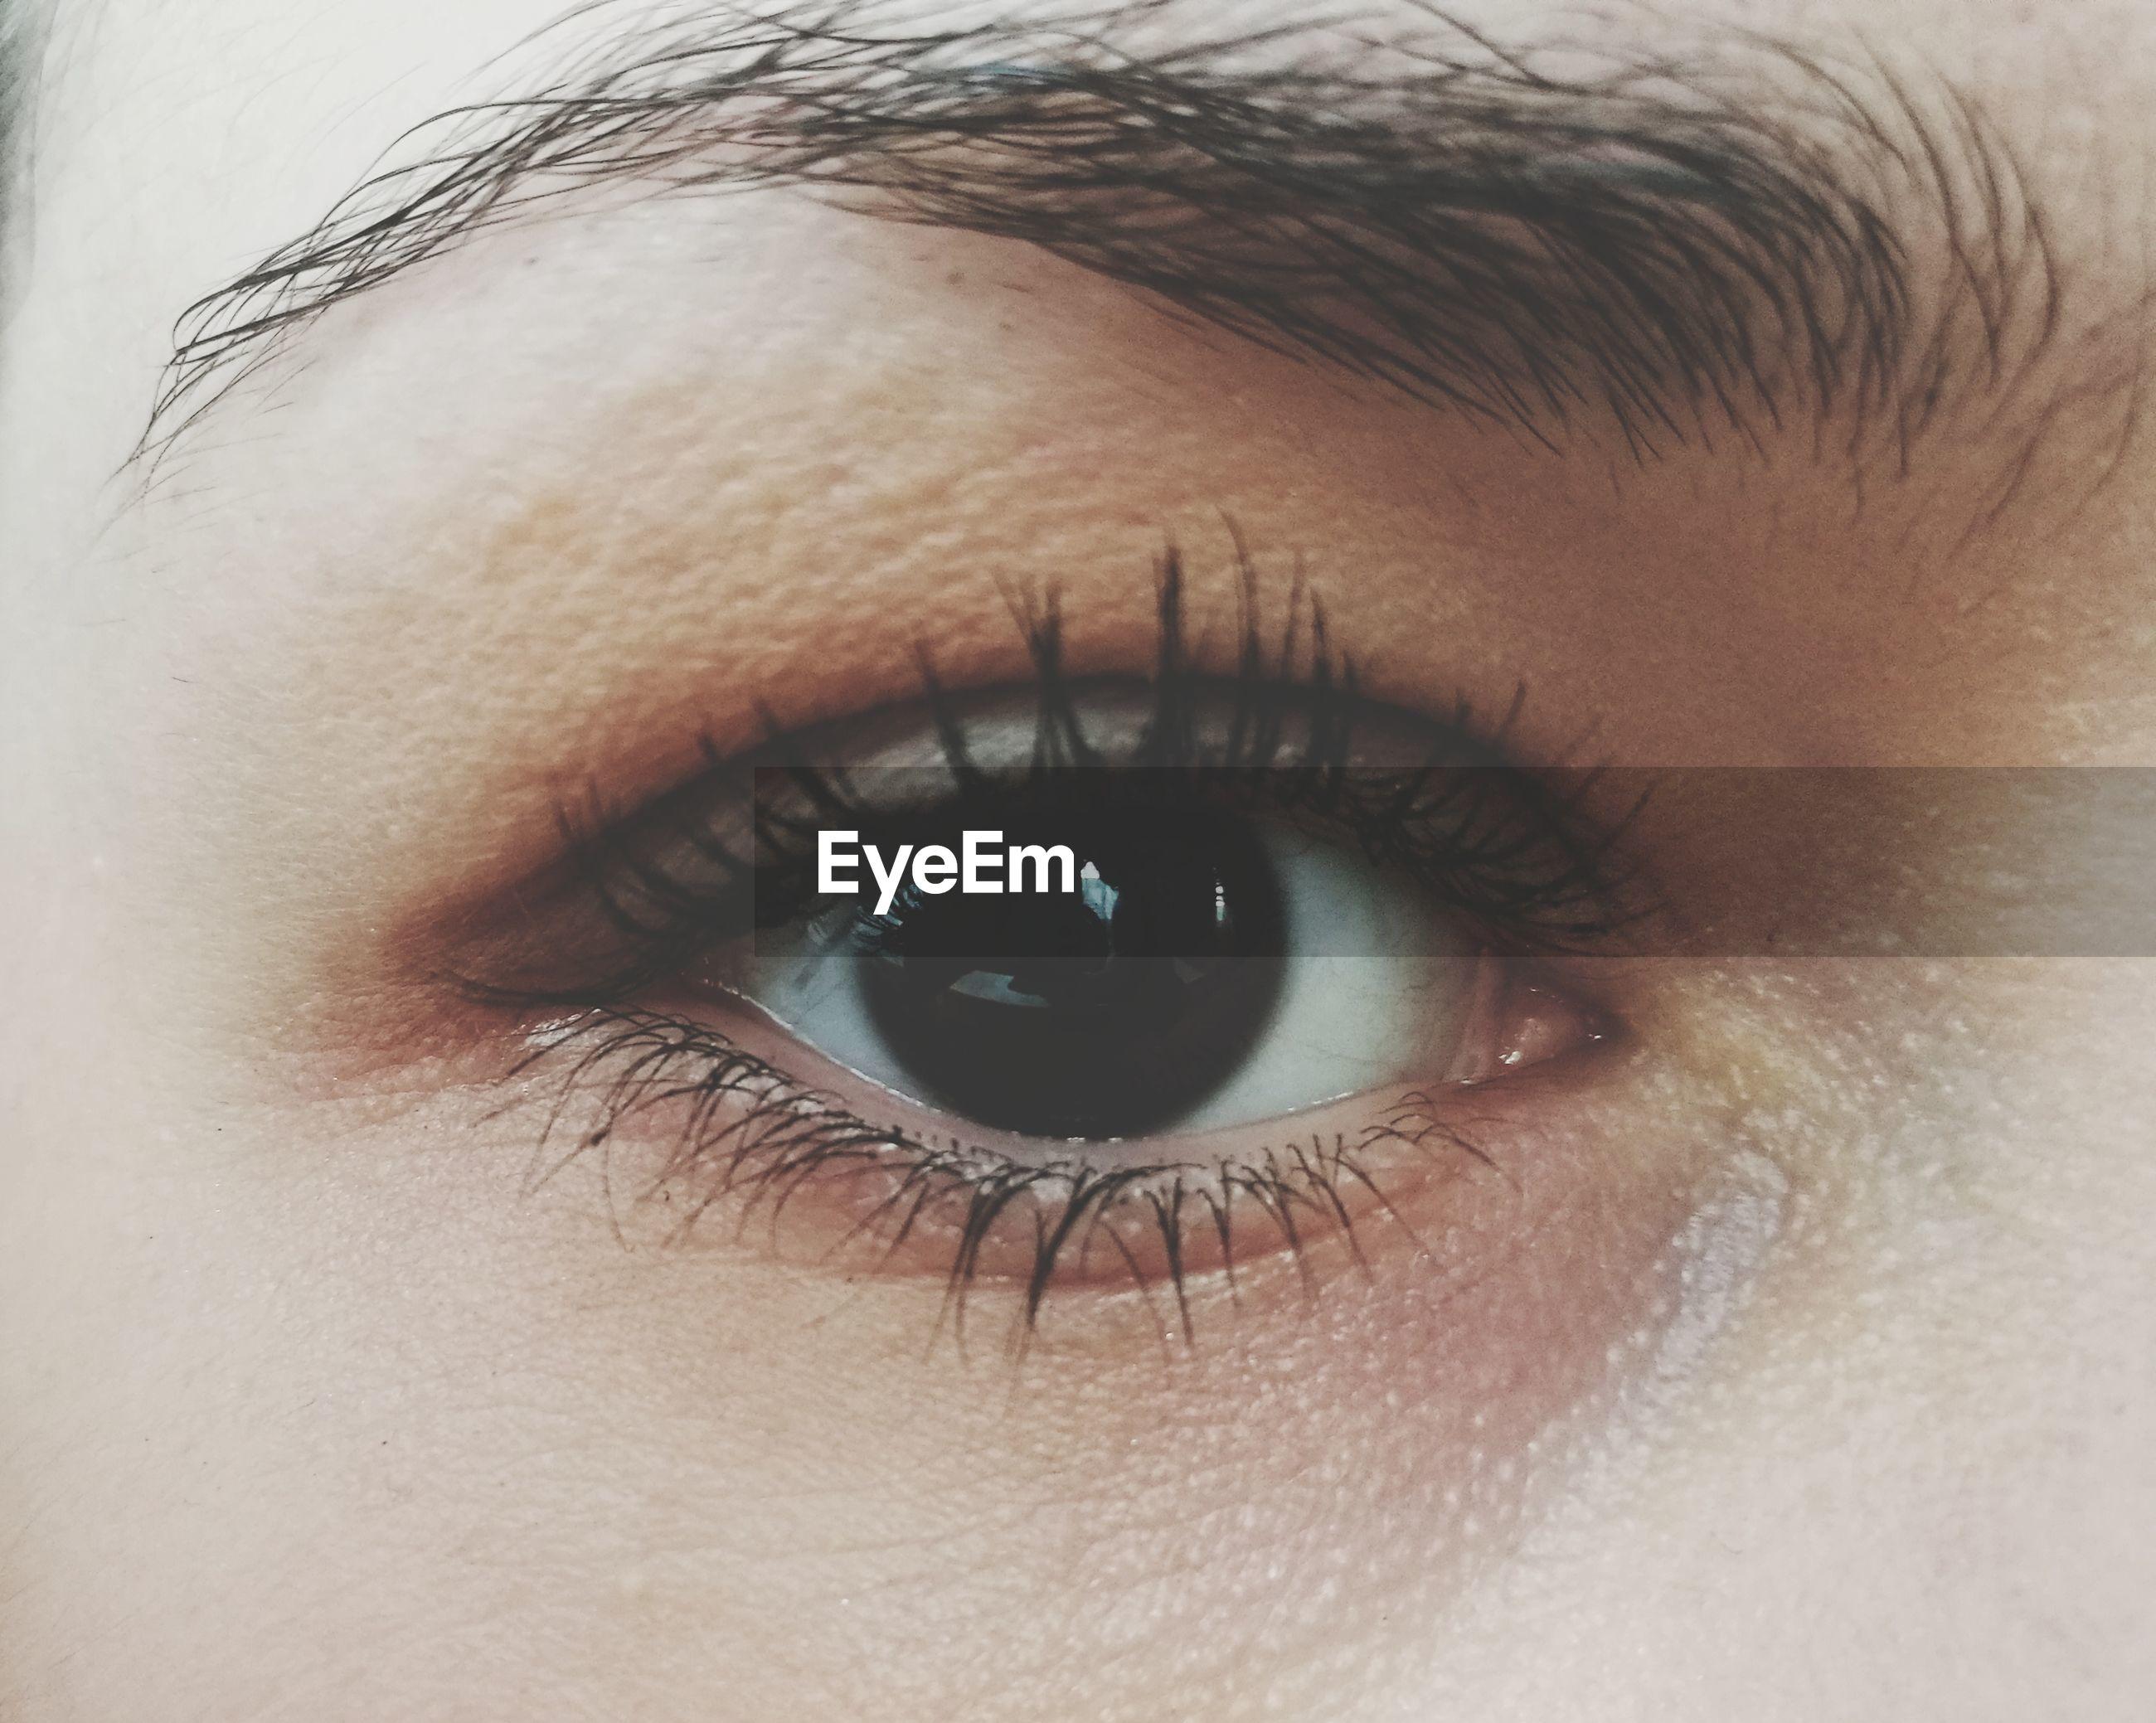 human eye, looking at camera, eyelash, portrait, one person, human body part, close-up, real people, eyeball, sensory perception, eyesight, human skin, eyebrow, iris - eye, indoors, day, people